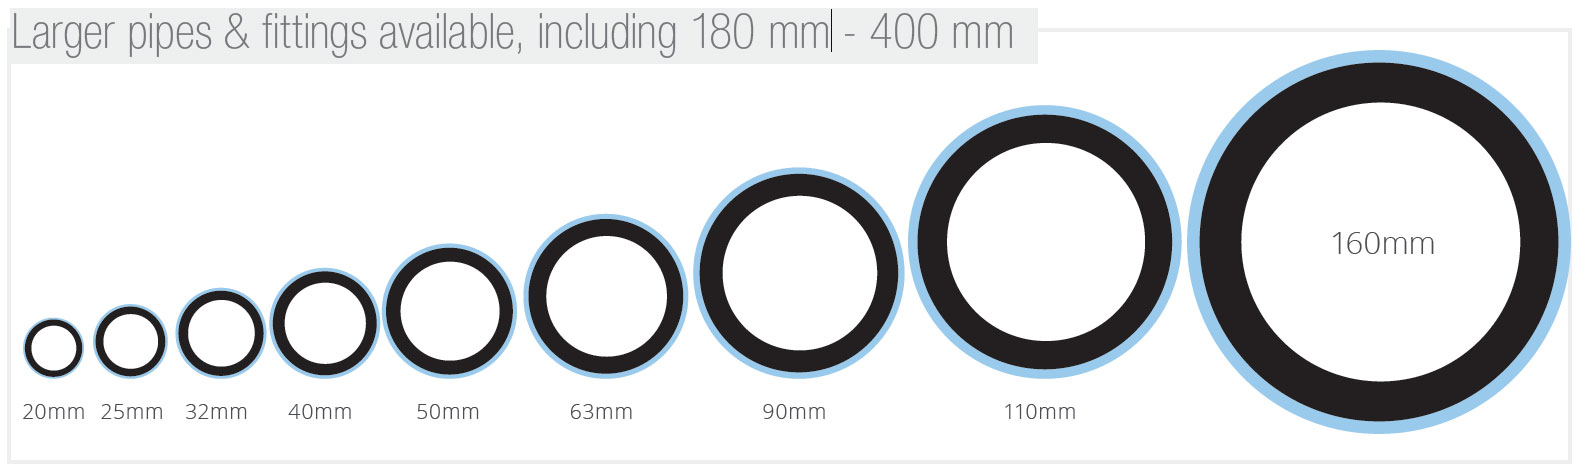 ecom-pipesystems-poly-sizes.jpg